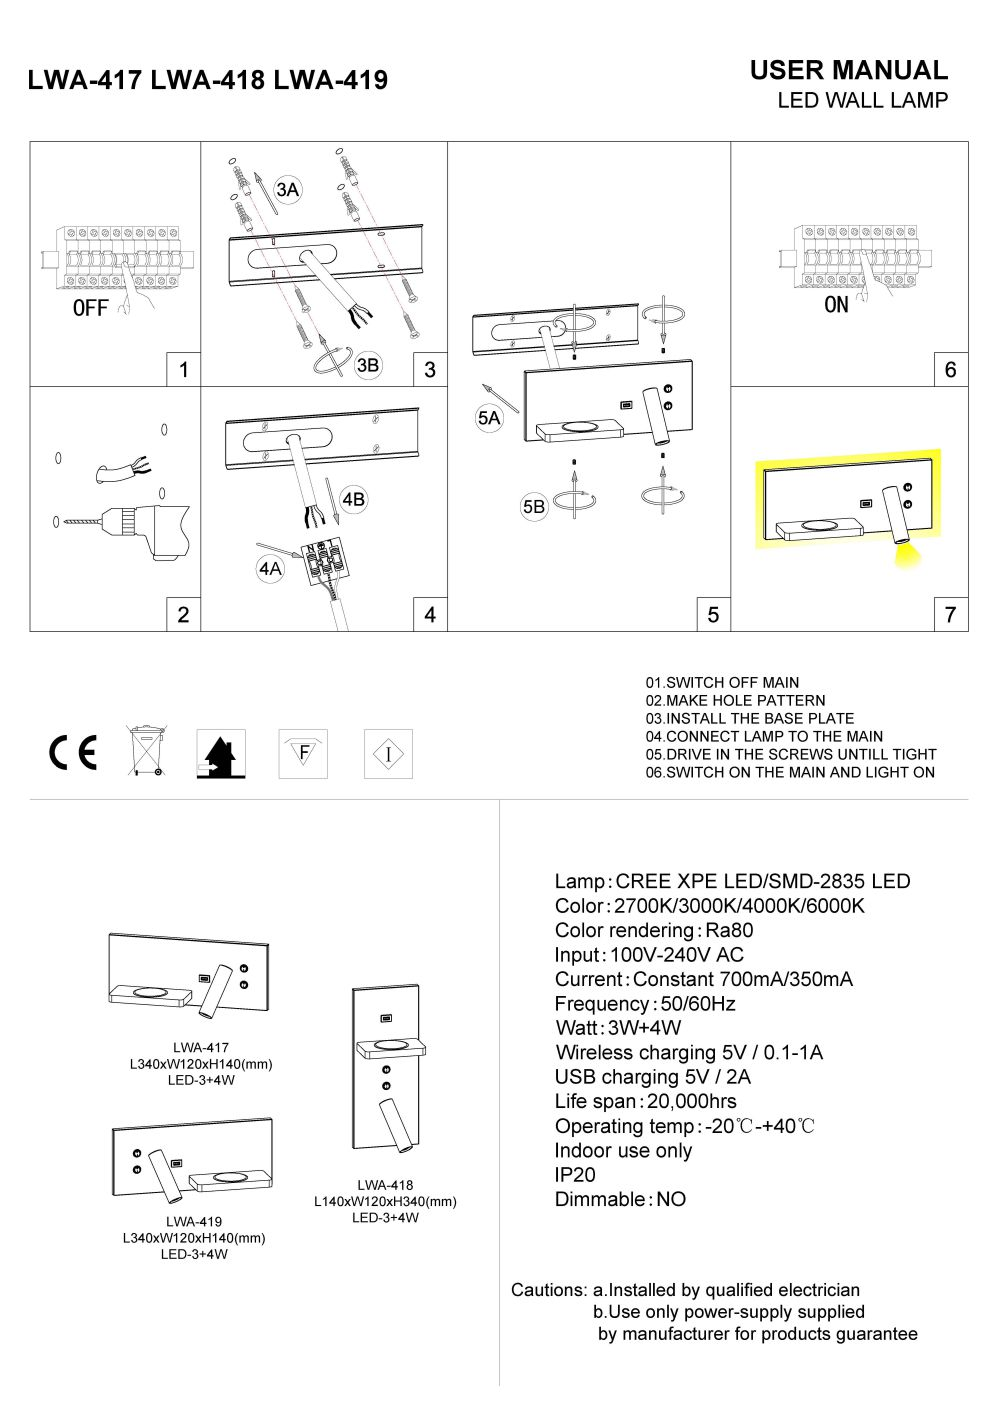 LWA-418 LED reading light installation guide